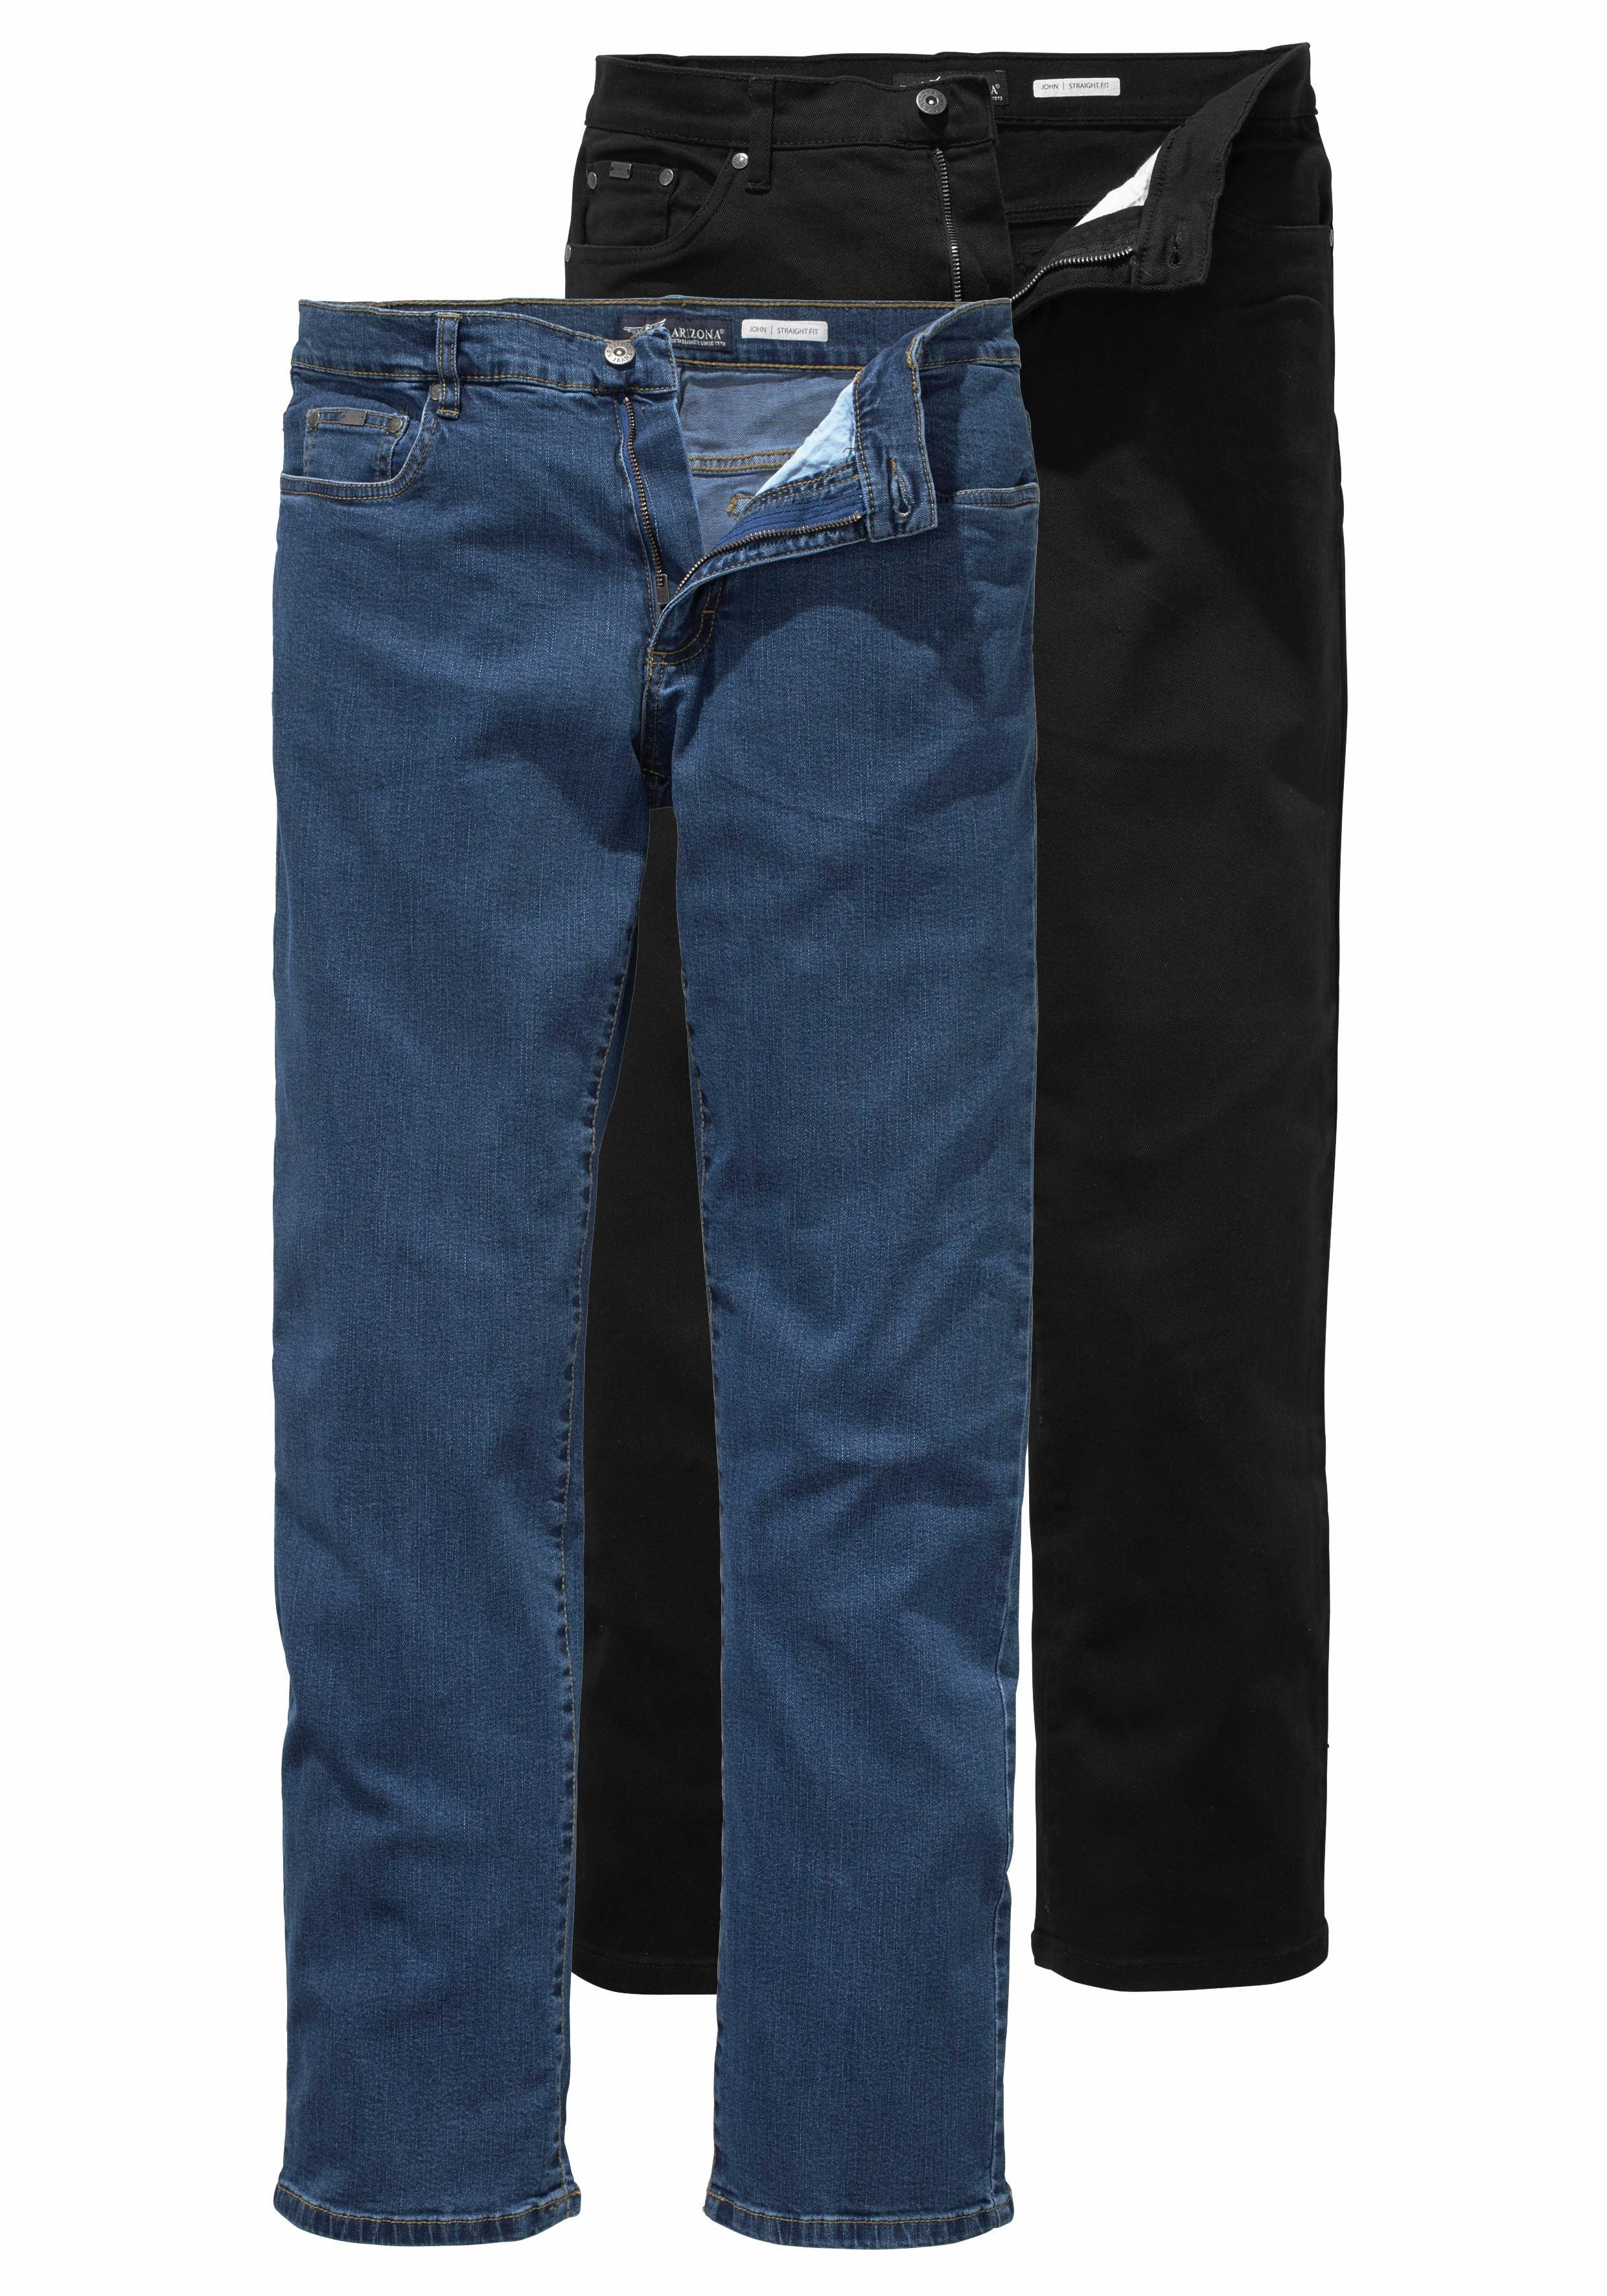 Arizona stretch jeans John Straight fit (set, 2-delig) voordelig en veilig online kopen